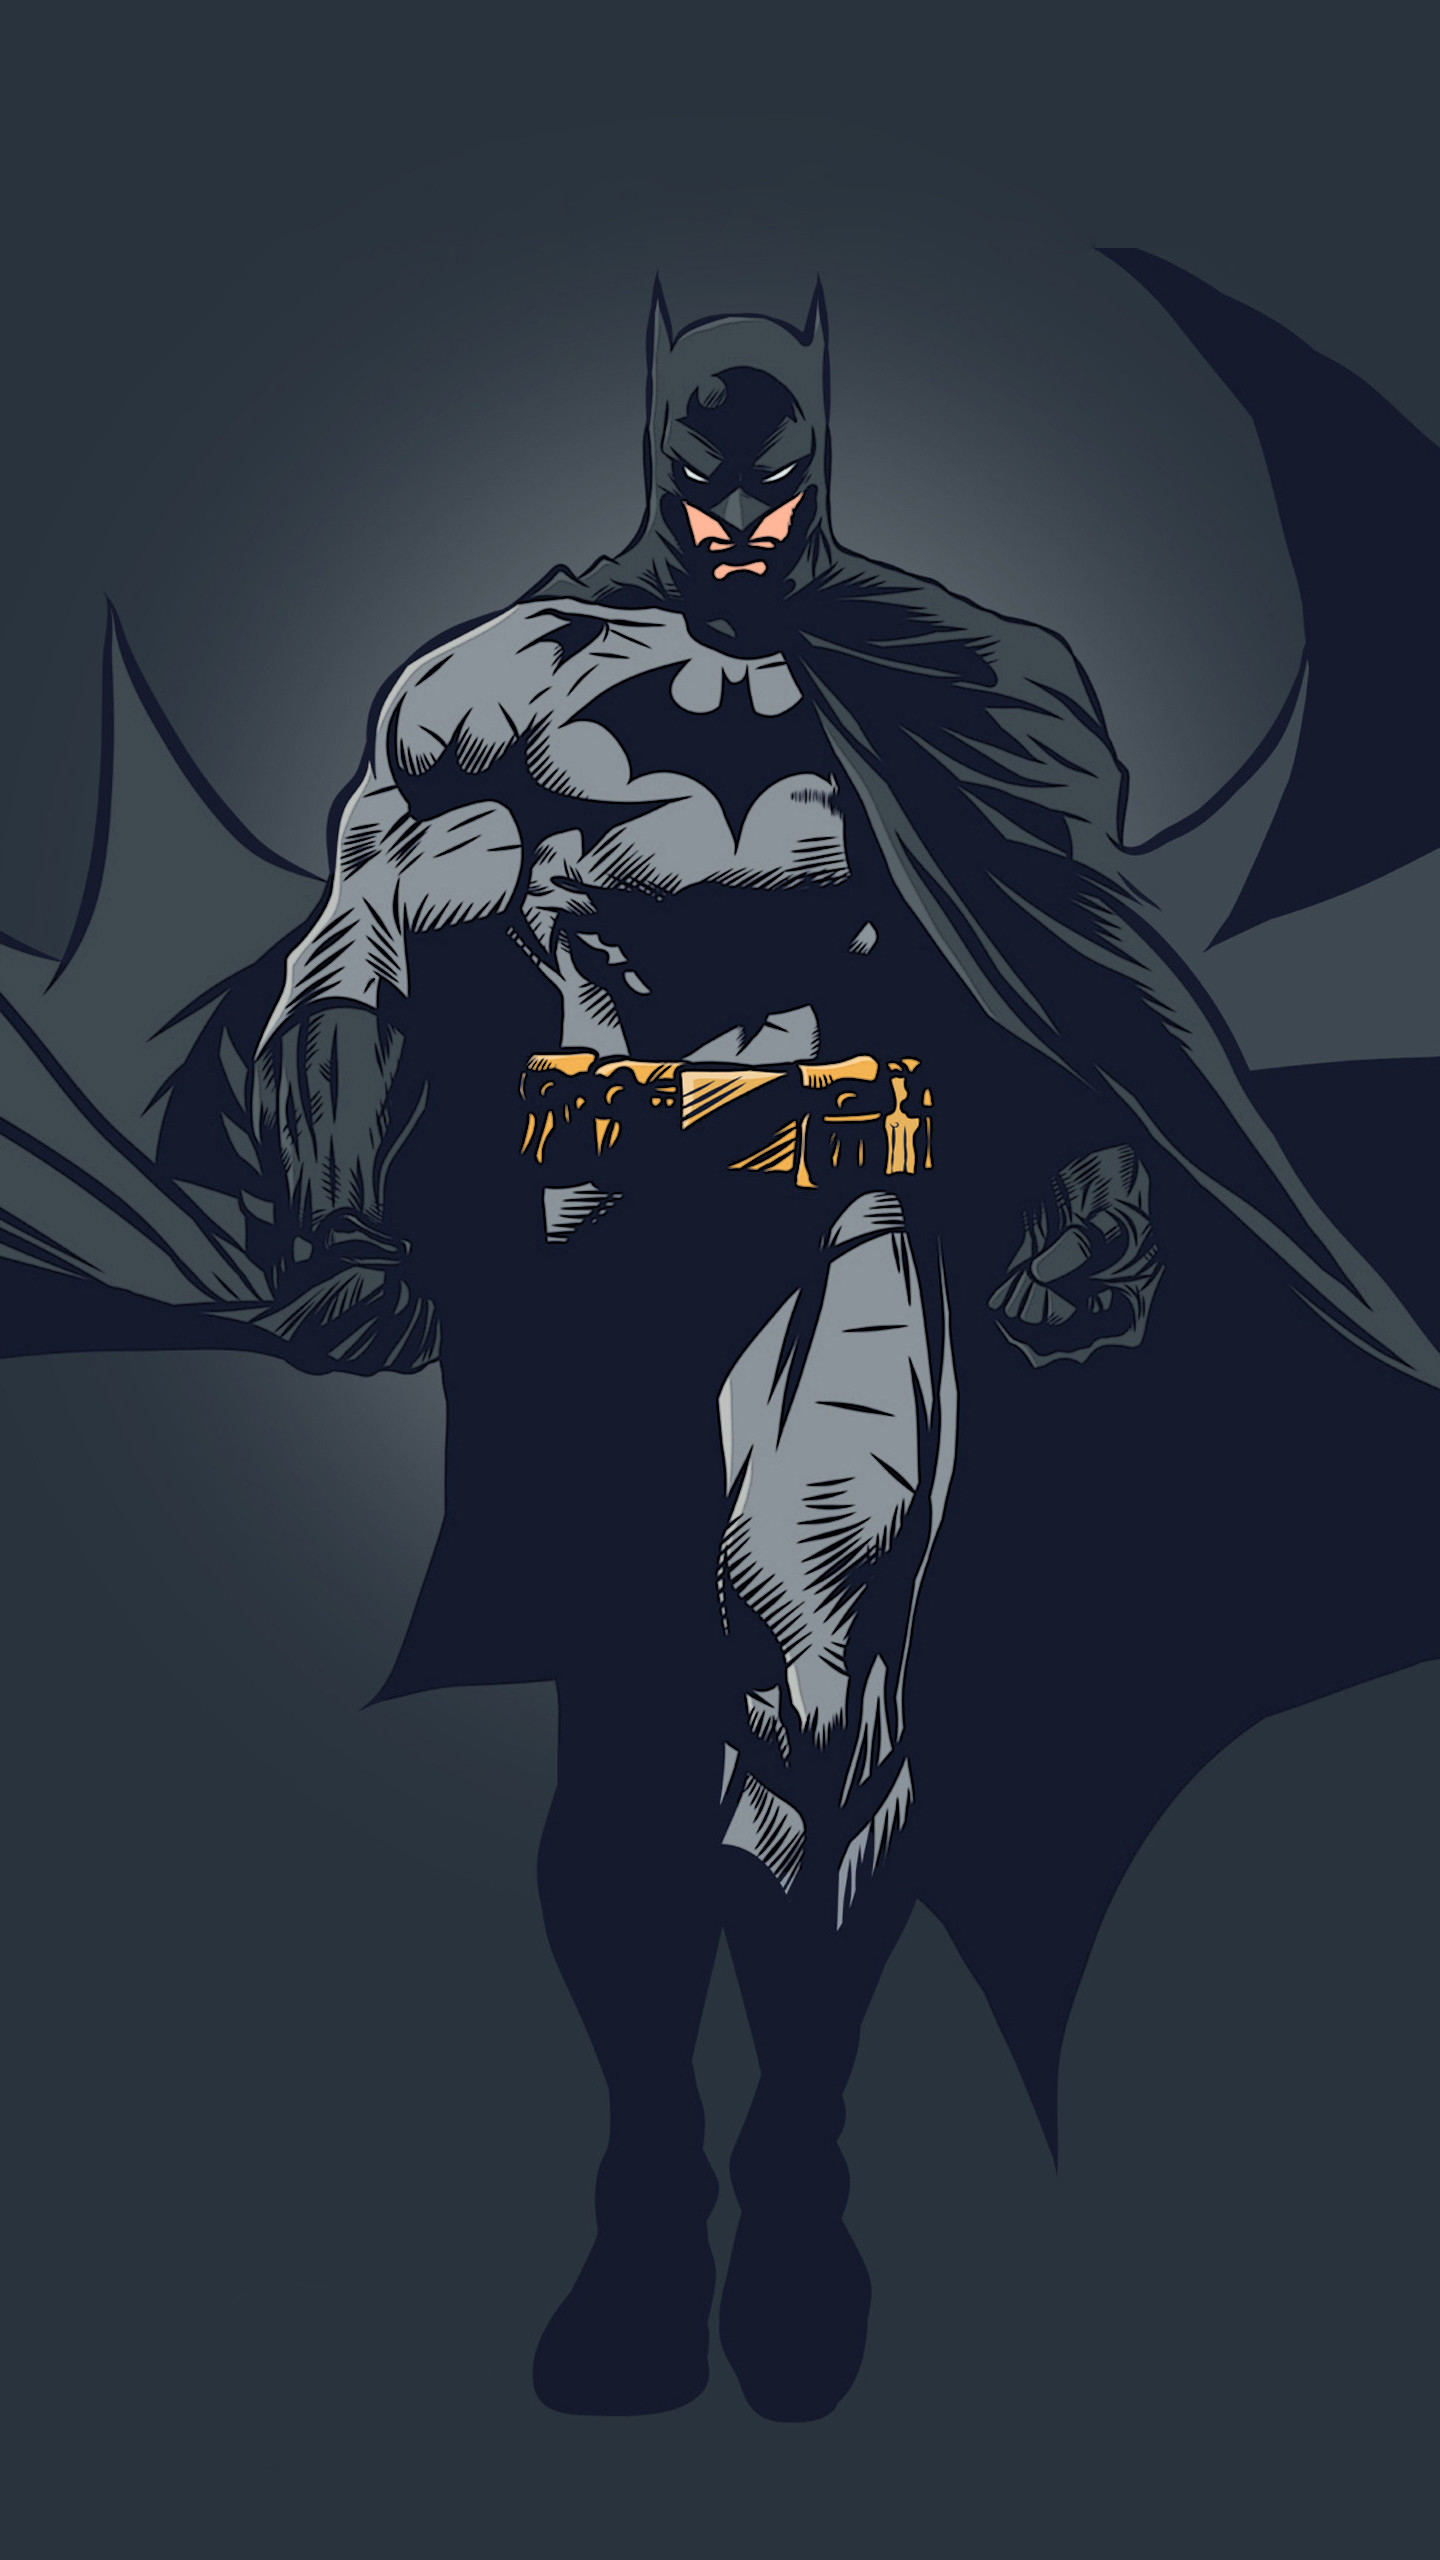 1920x1080 Simple Background Batman Blo0p DC Comics Joker Minimalism